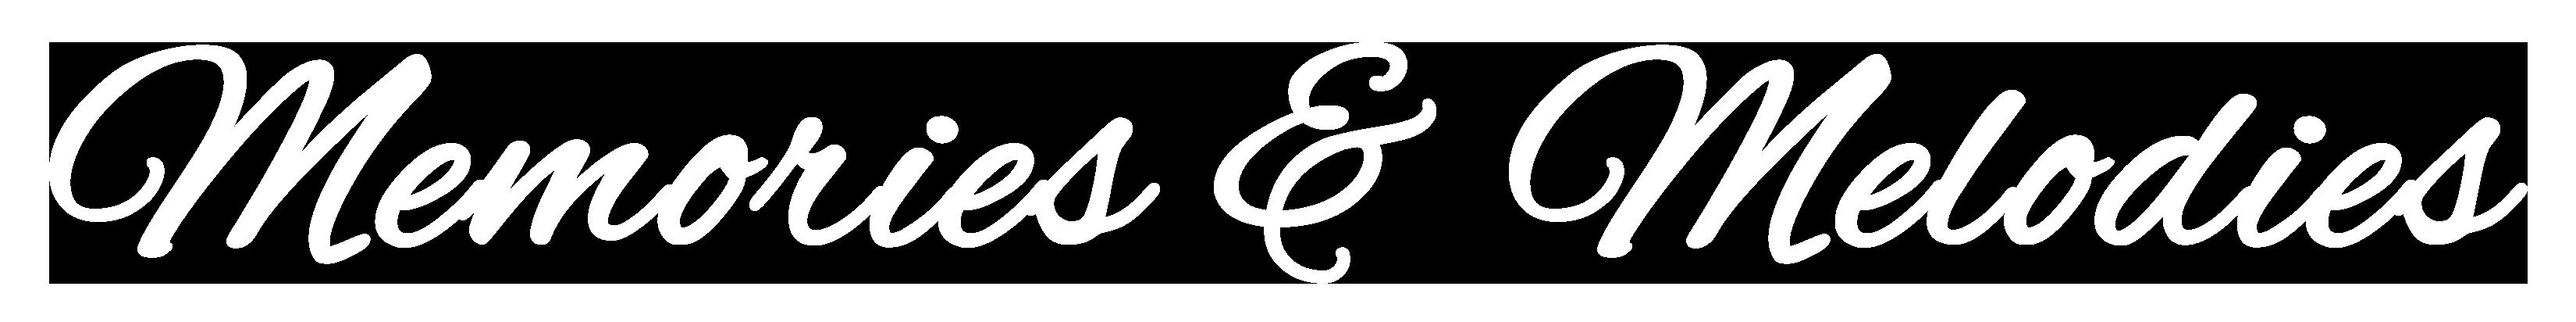 Memories & Melodies Logo White